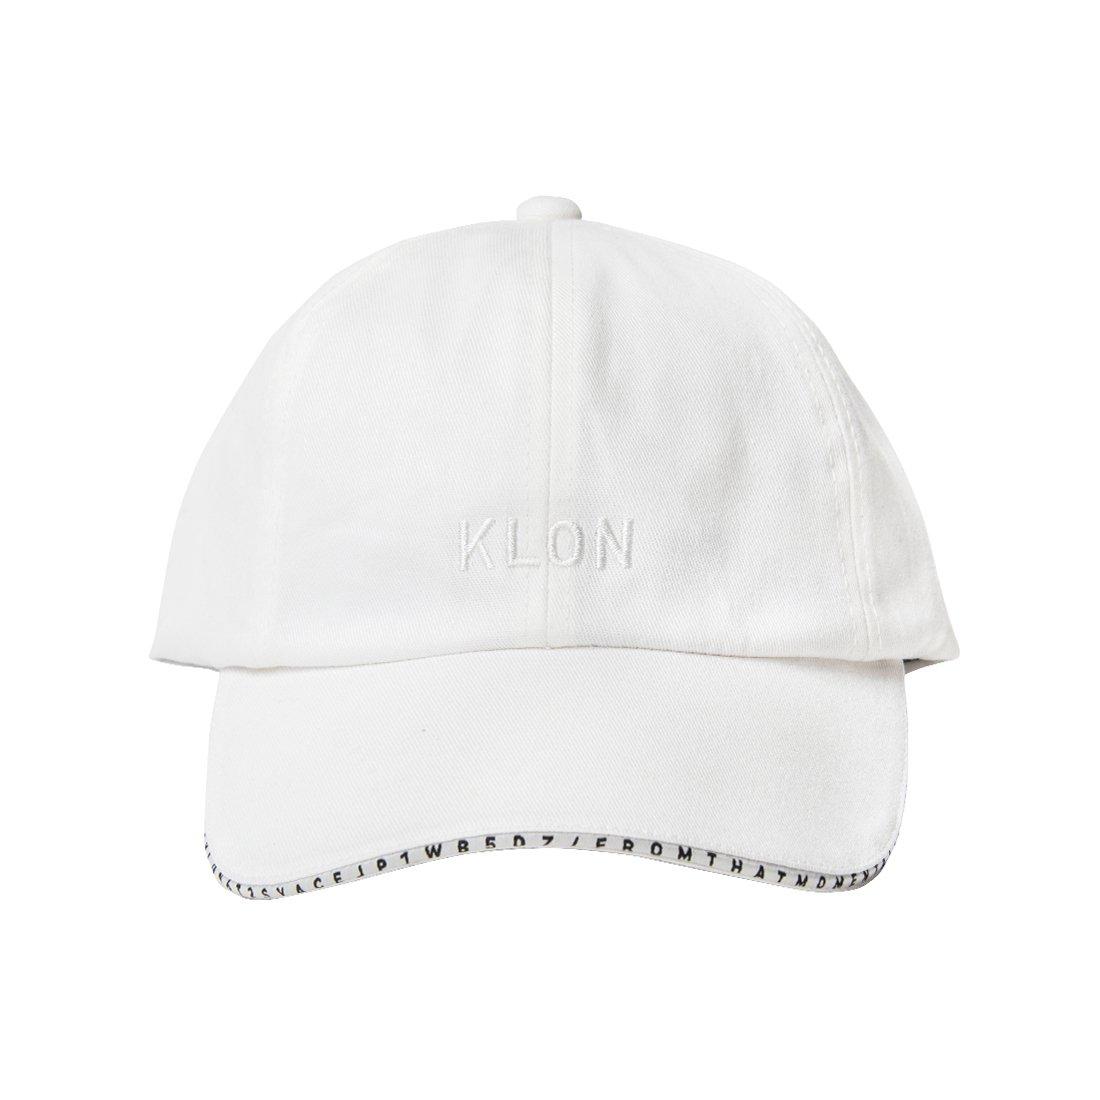 KLON CAP SERIAL NUMBER LINE WHITE